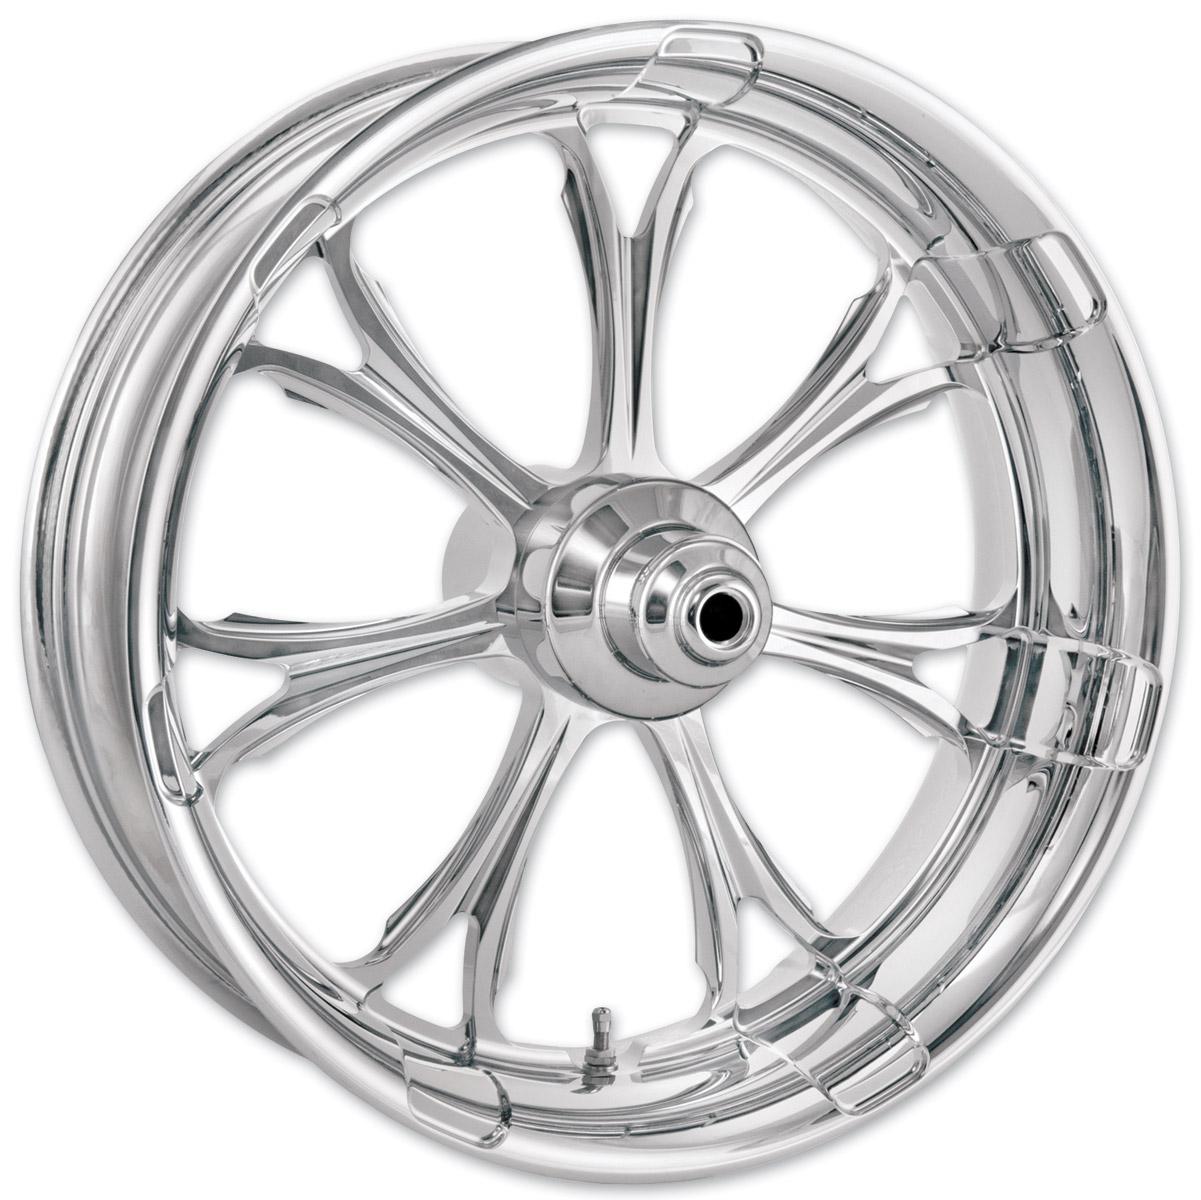 Performance Machine Paramount Chrome Front Wheel, 21″ X 2.15″